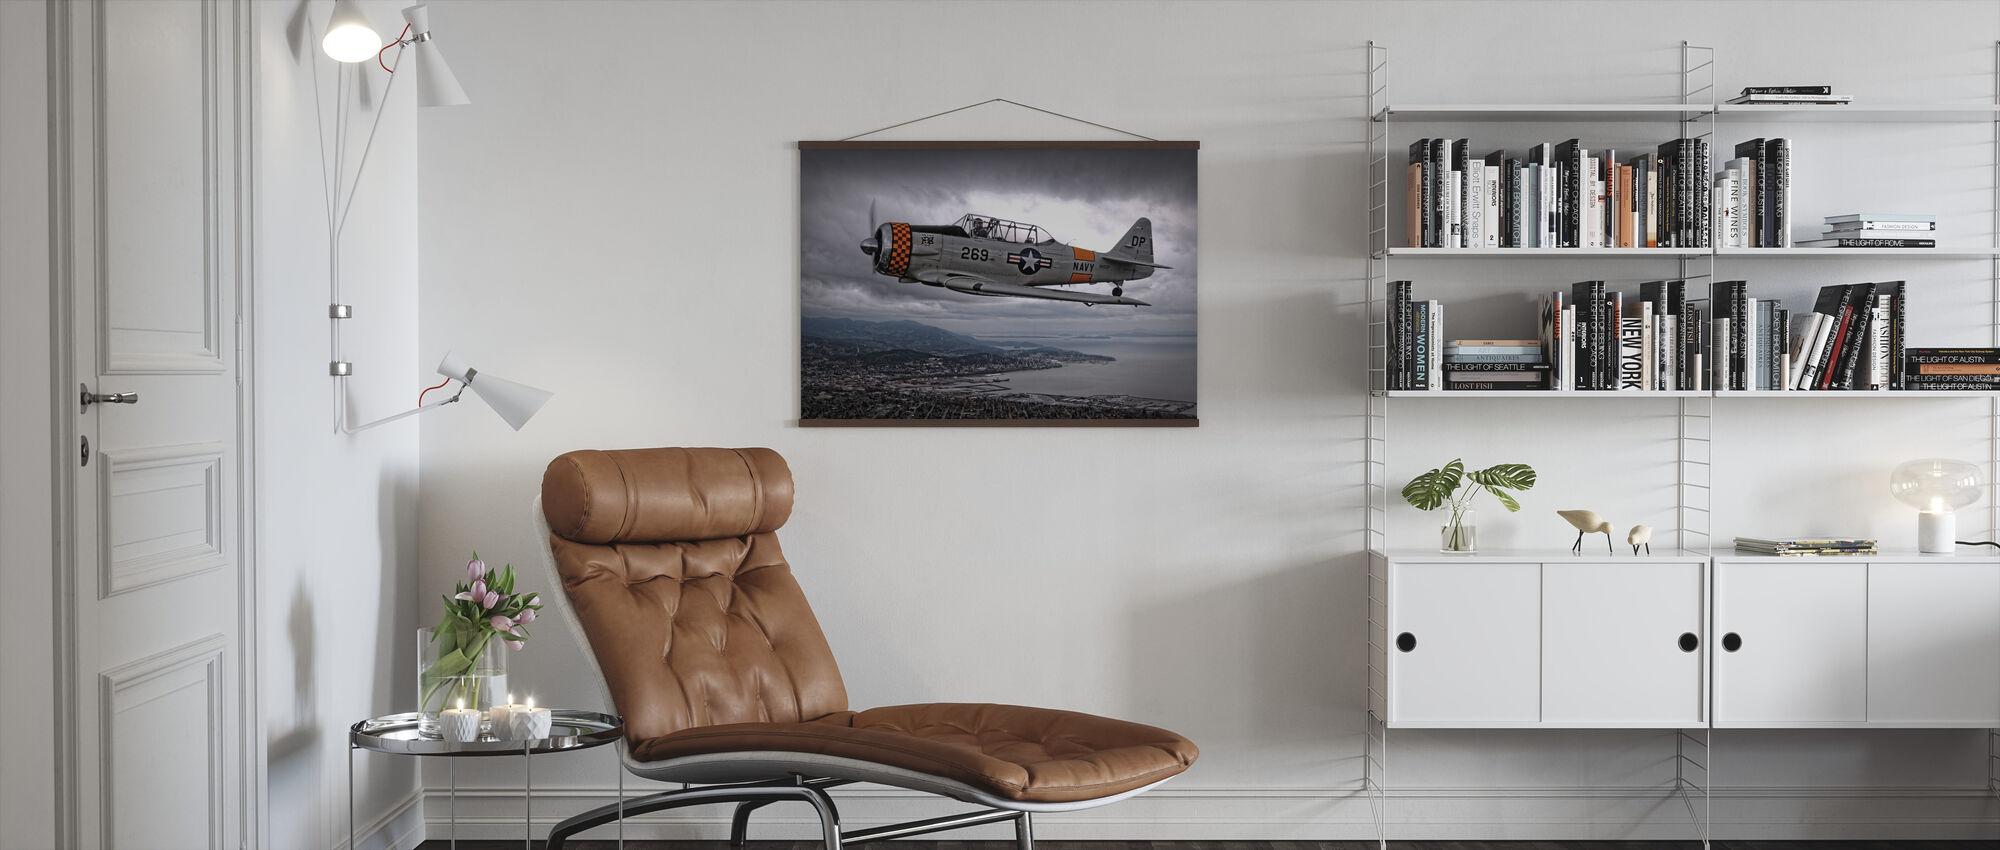 Over Under - Poster - Living Room